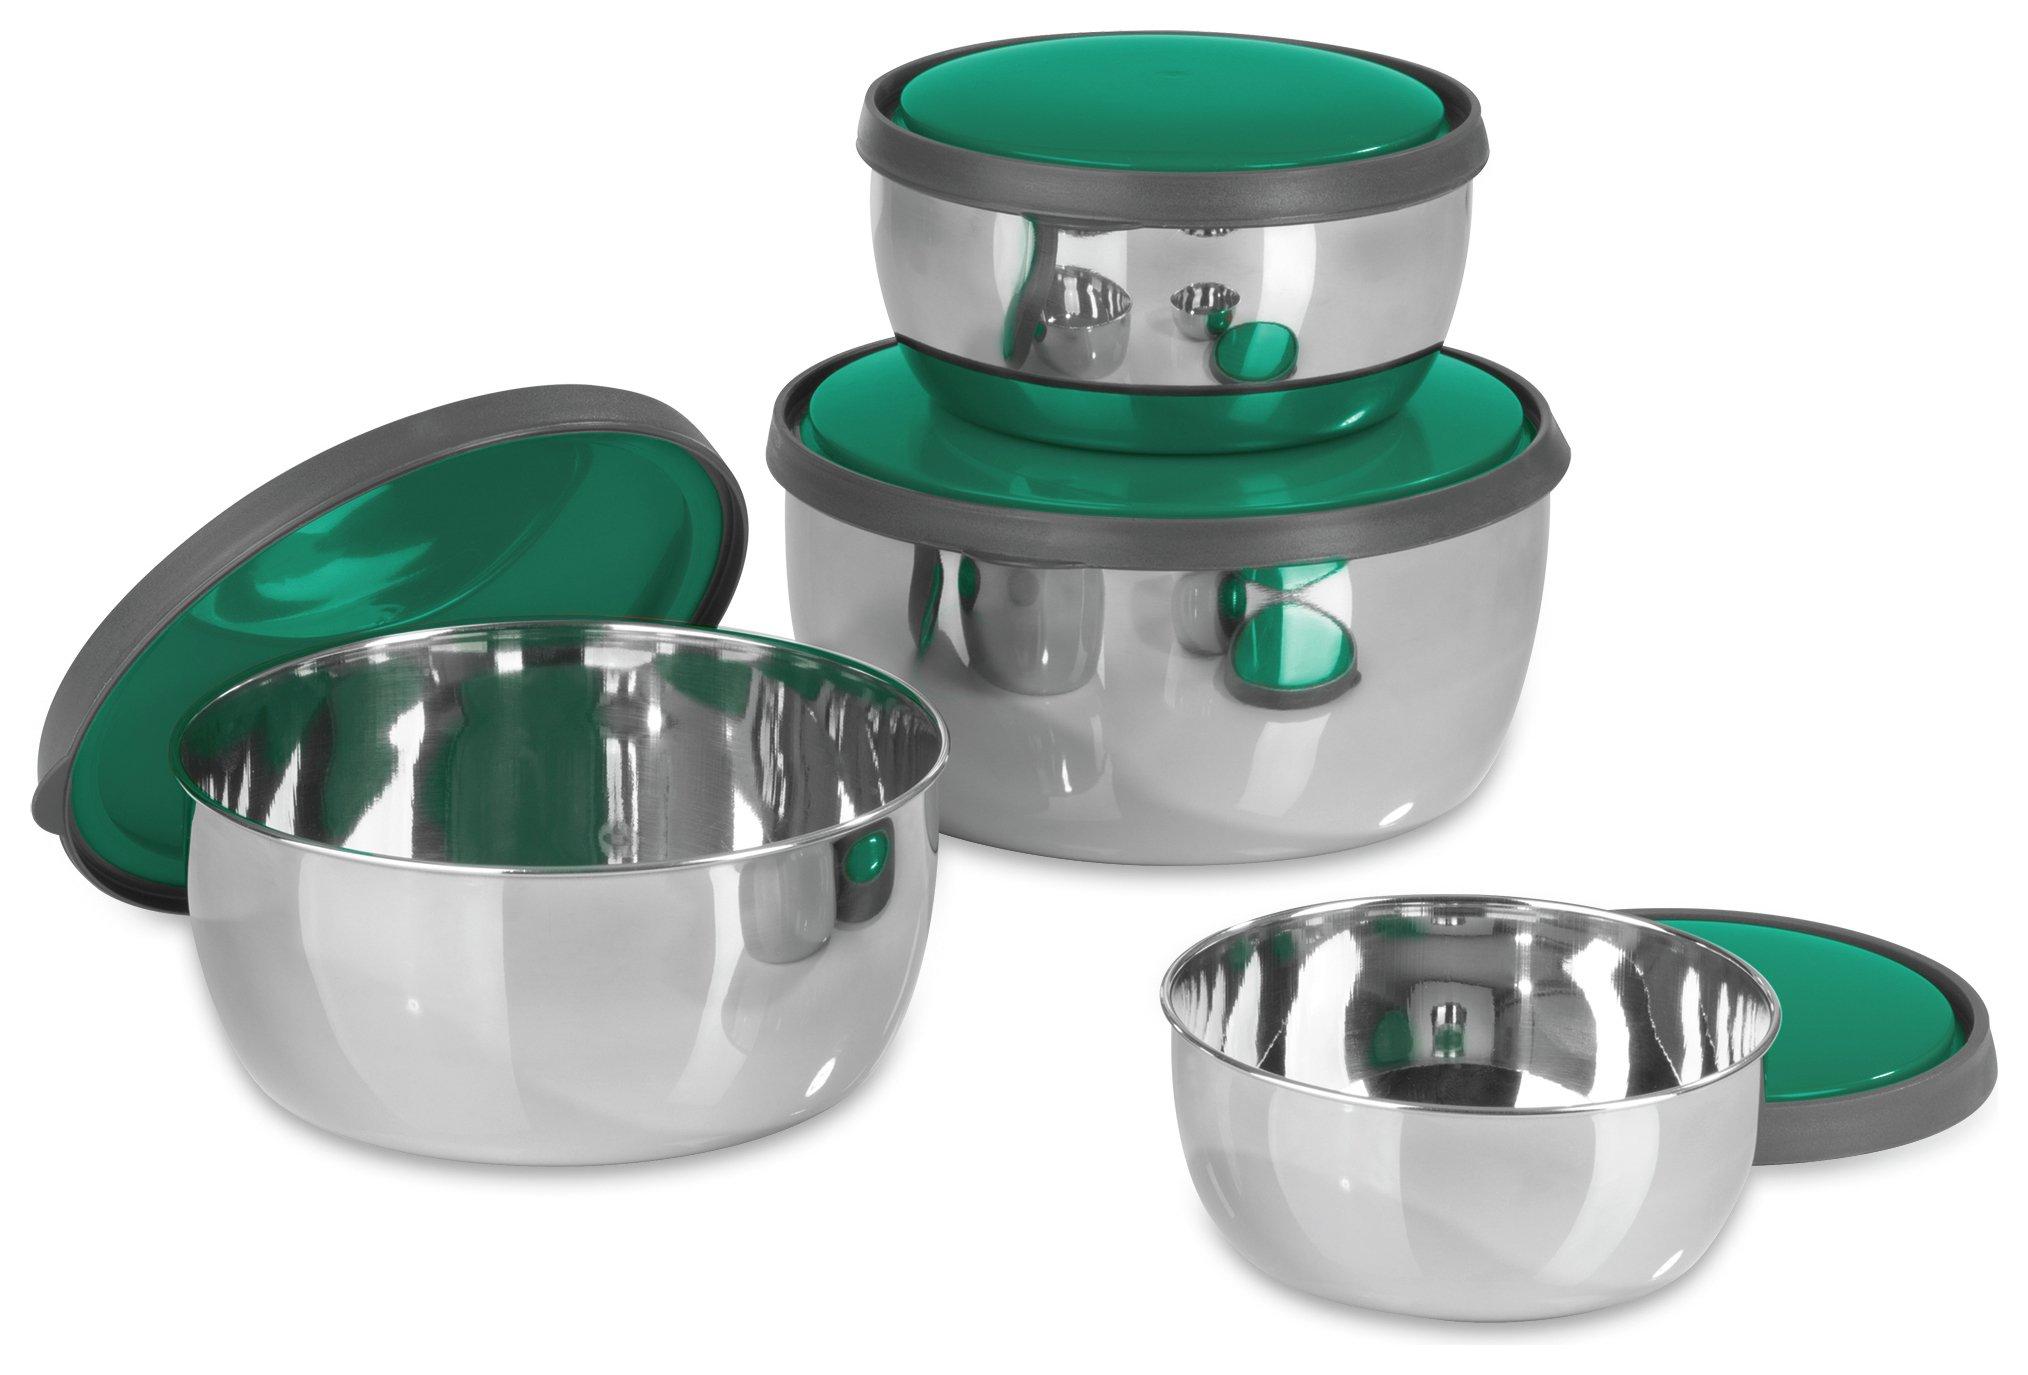 GOURMETmaxx 4 Piece Stainless Steel Bowl Set £6.50 @ Argos (Free C&C) 2 Year Guarantee